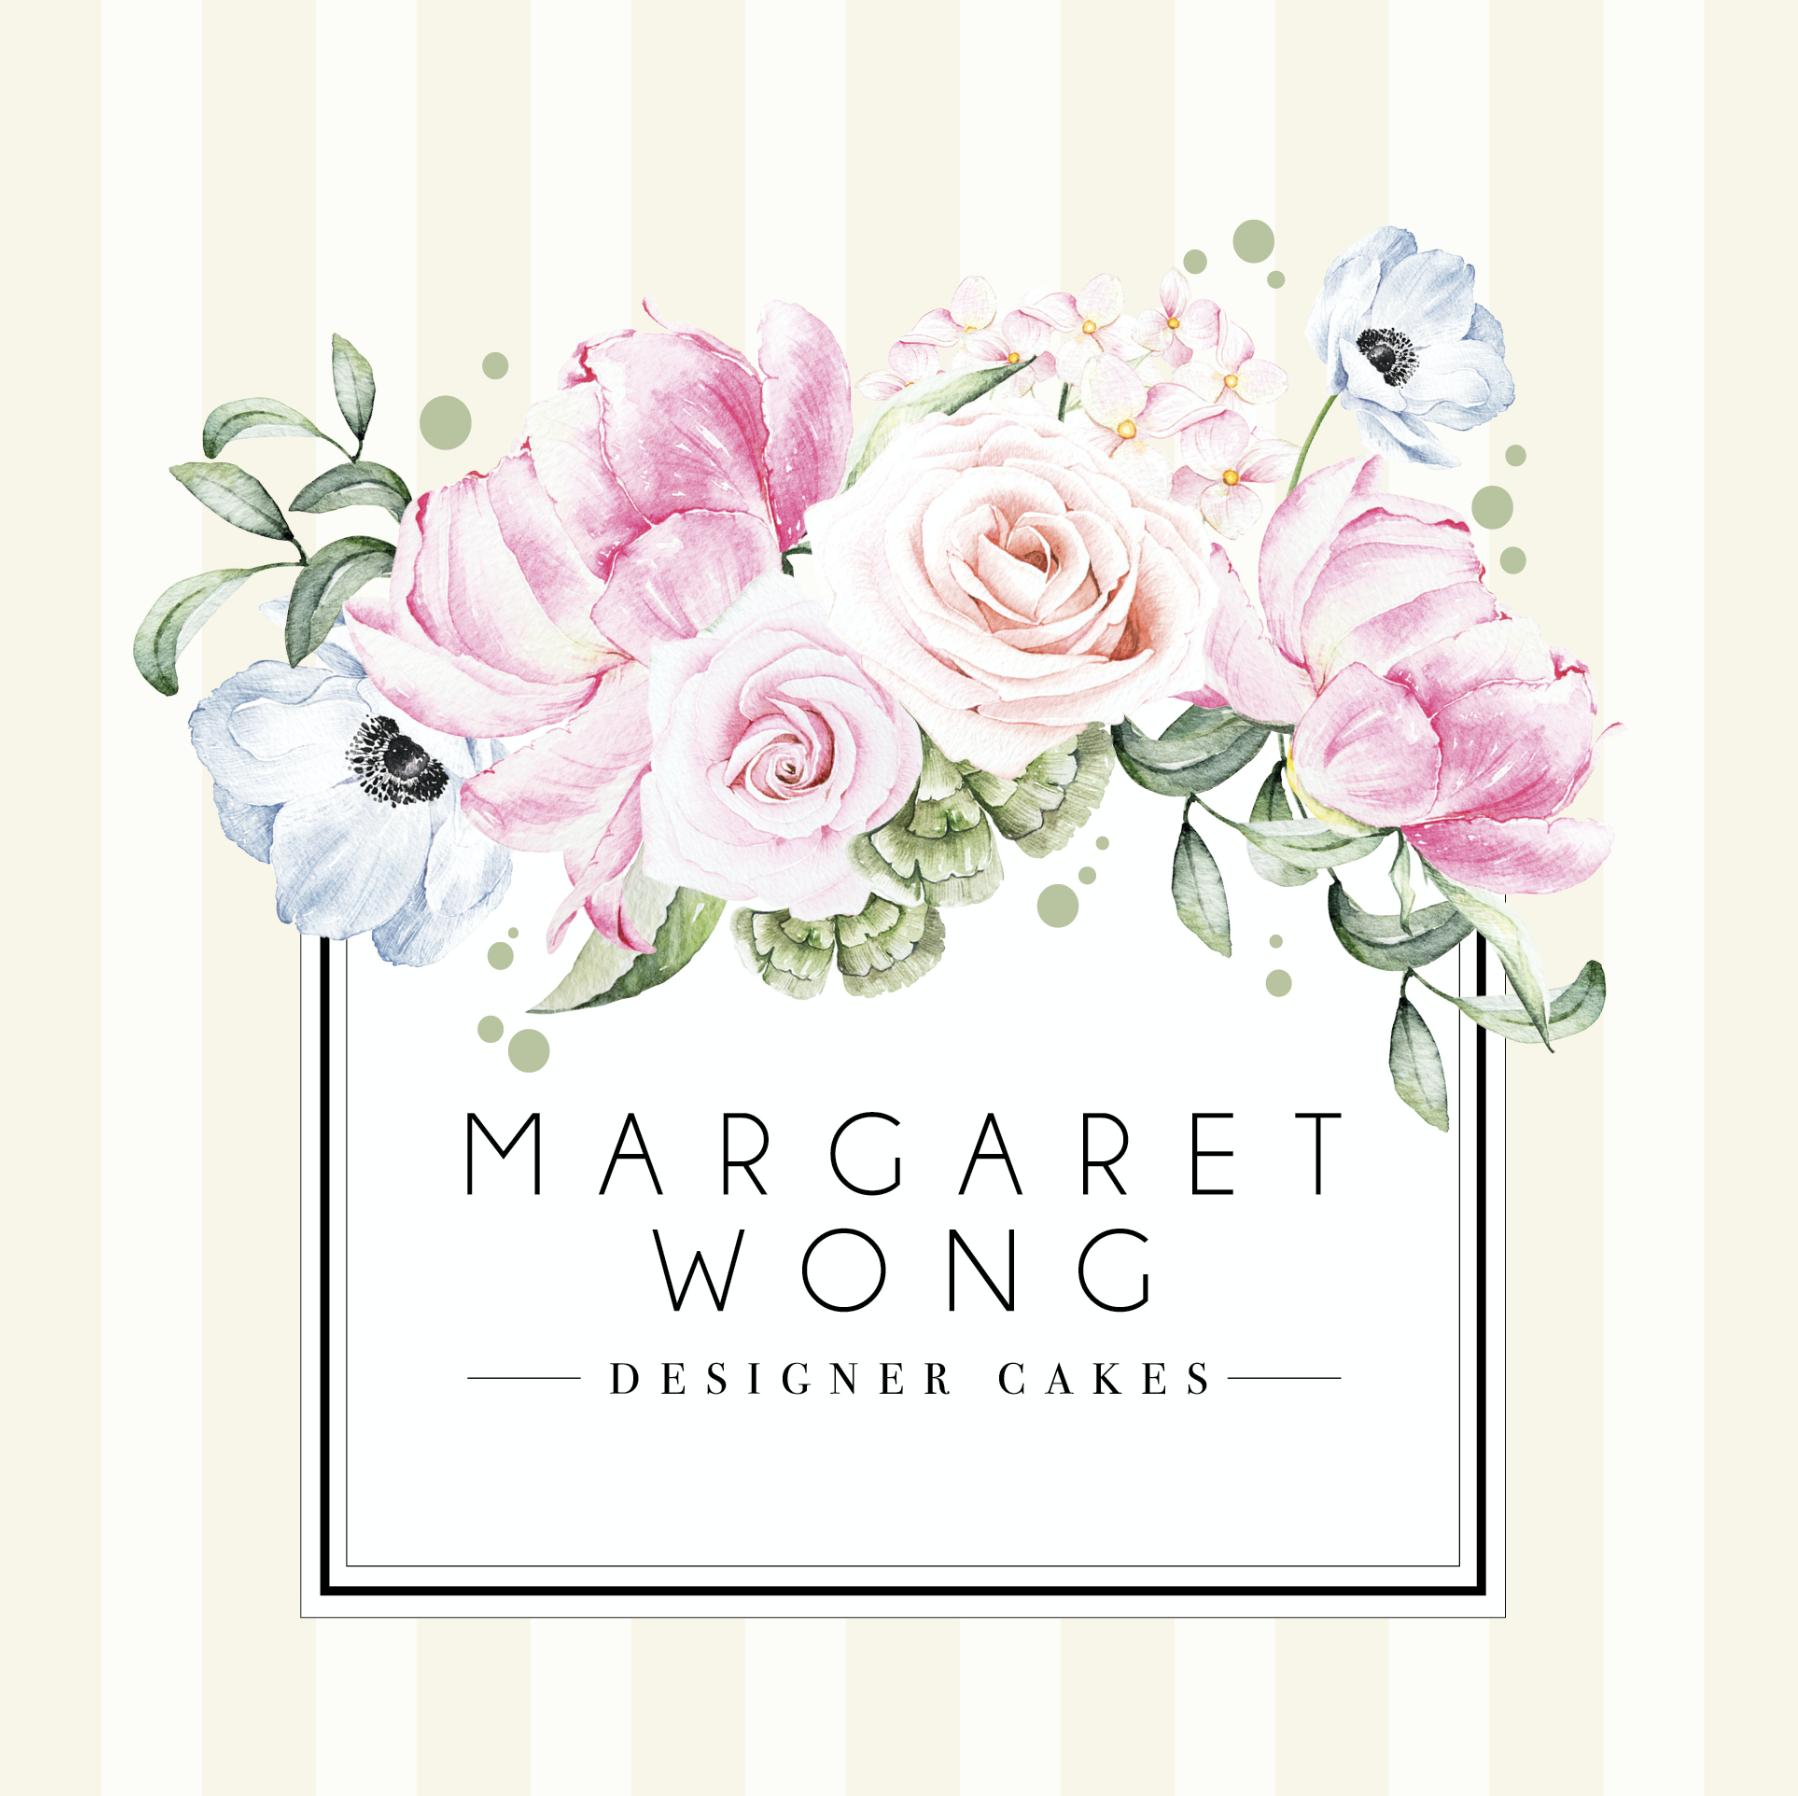 a logo design for margaret wong a cake designer from hong kong